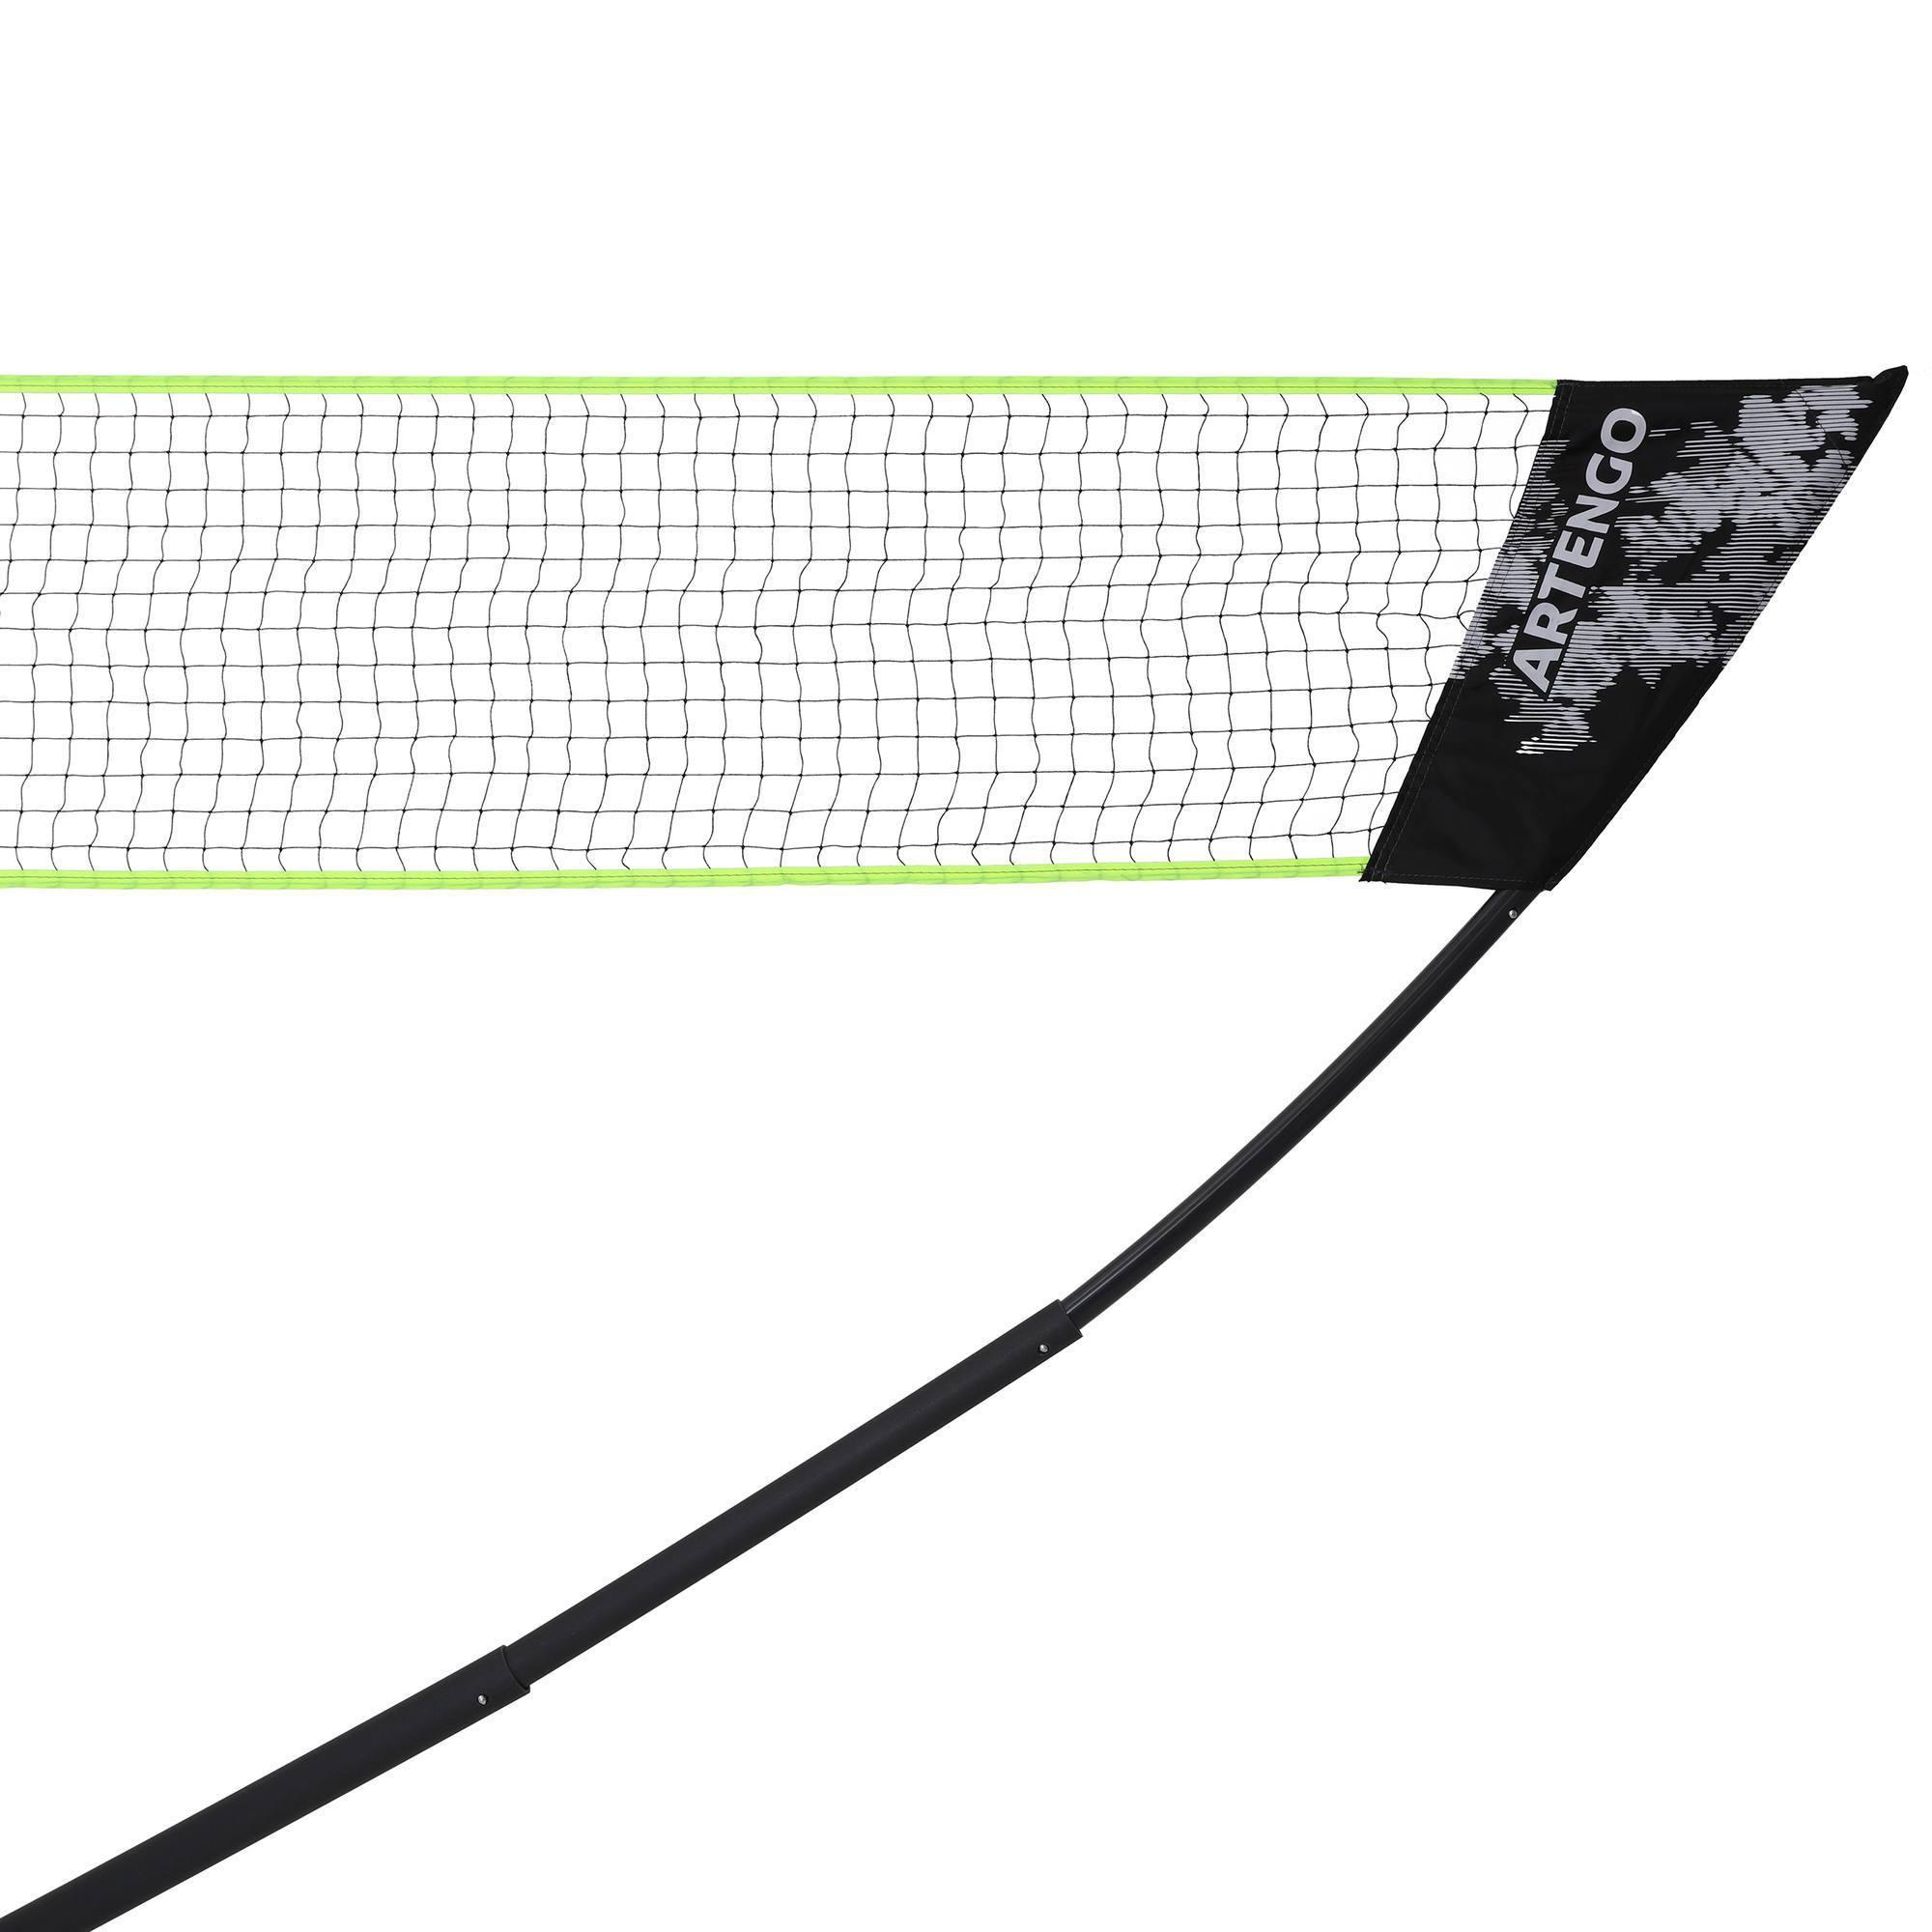 filet de badminton easy net 5m clubs collectivit s. Black Bedroom Furniture Sets. Home Design Ideas